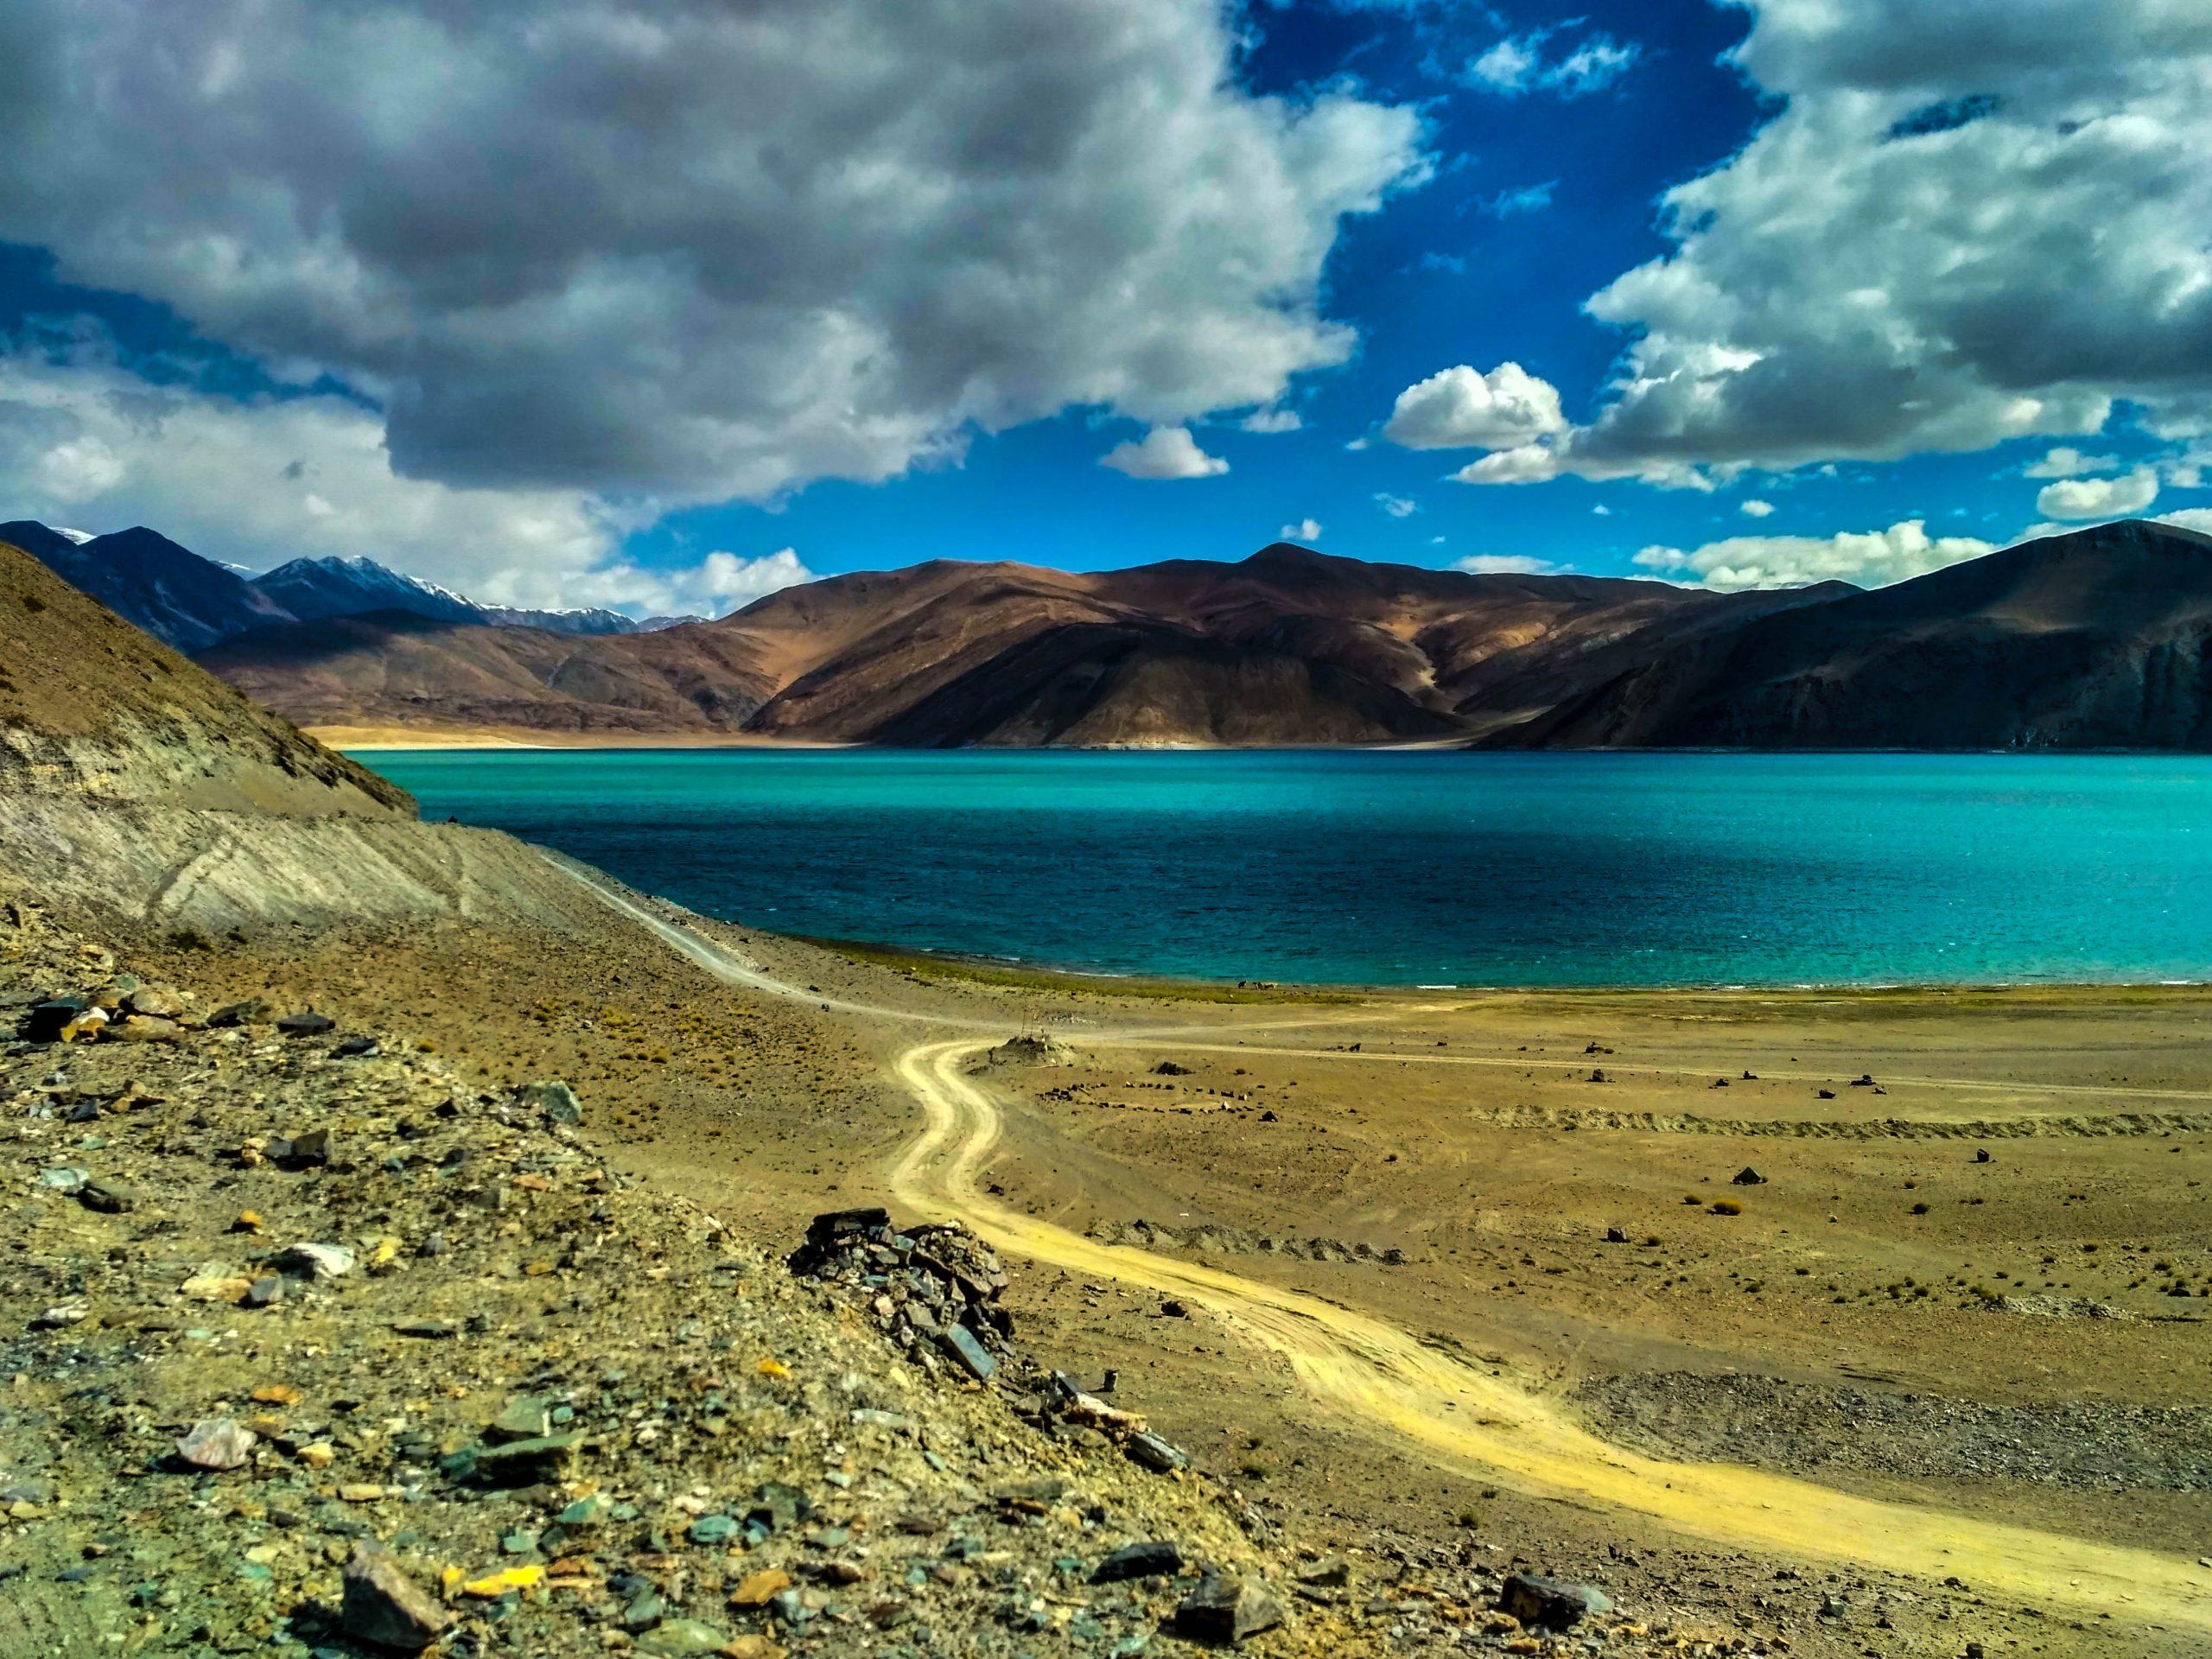 Beautiful Pangong lake in Leh.